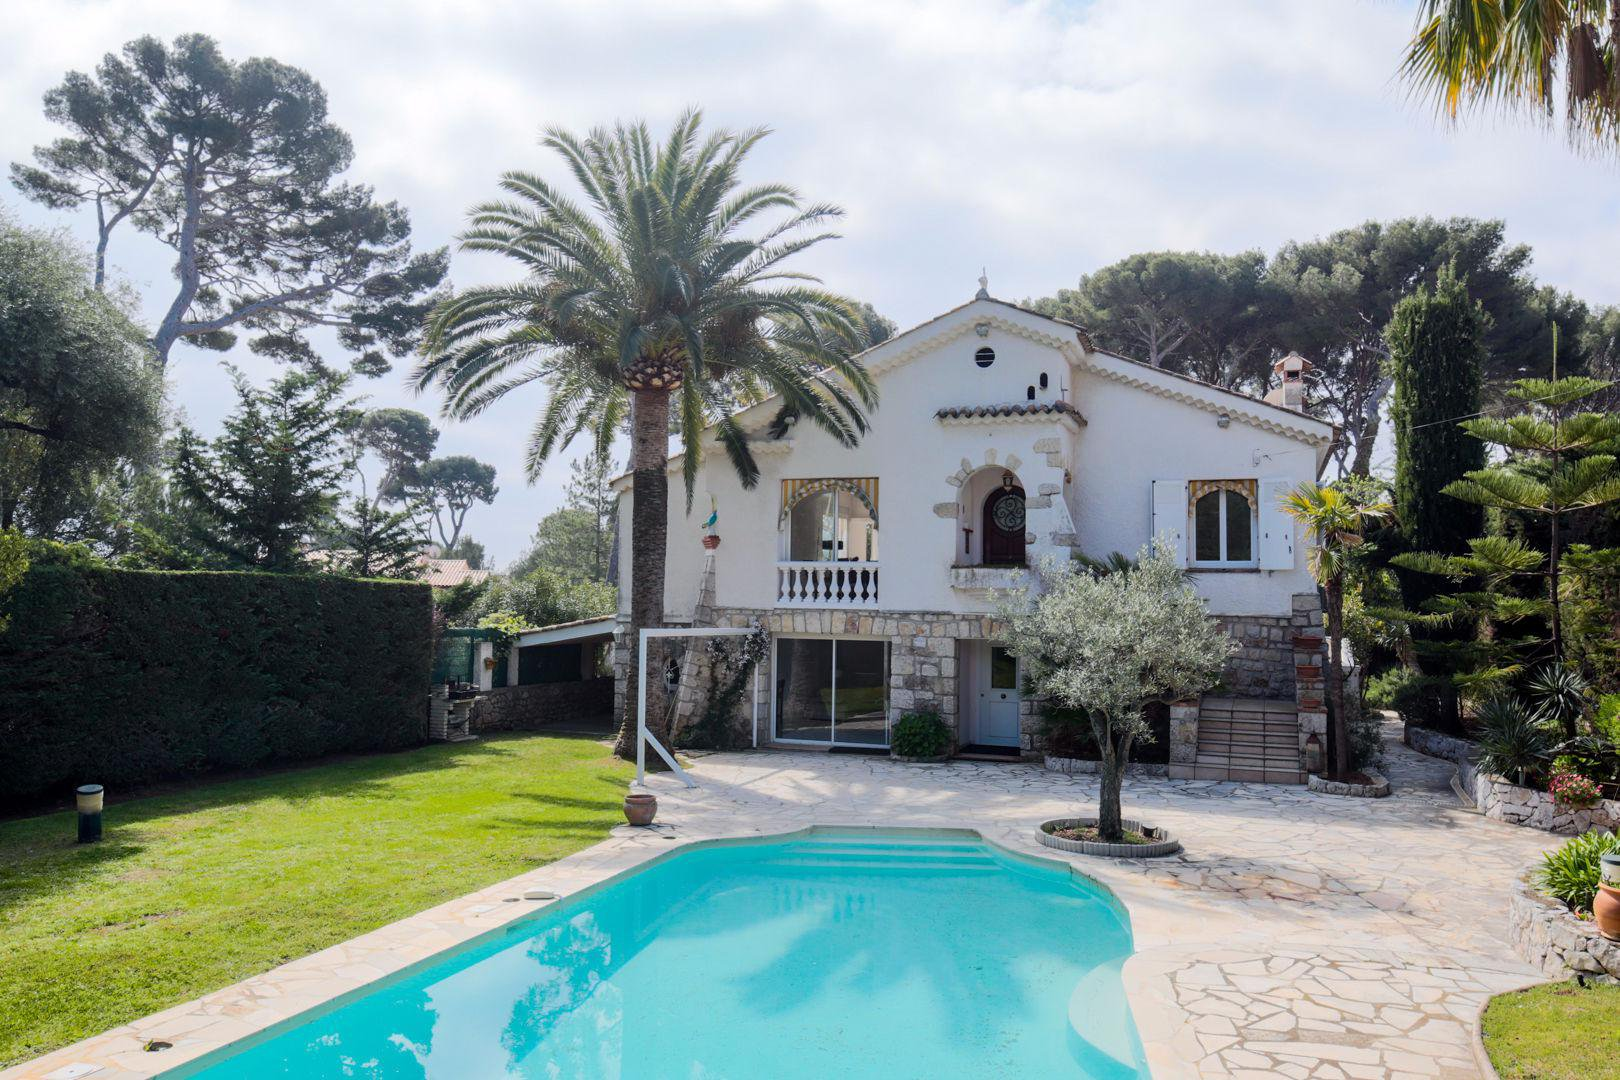 A vendre Villa Cap d'Antibes garoupe